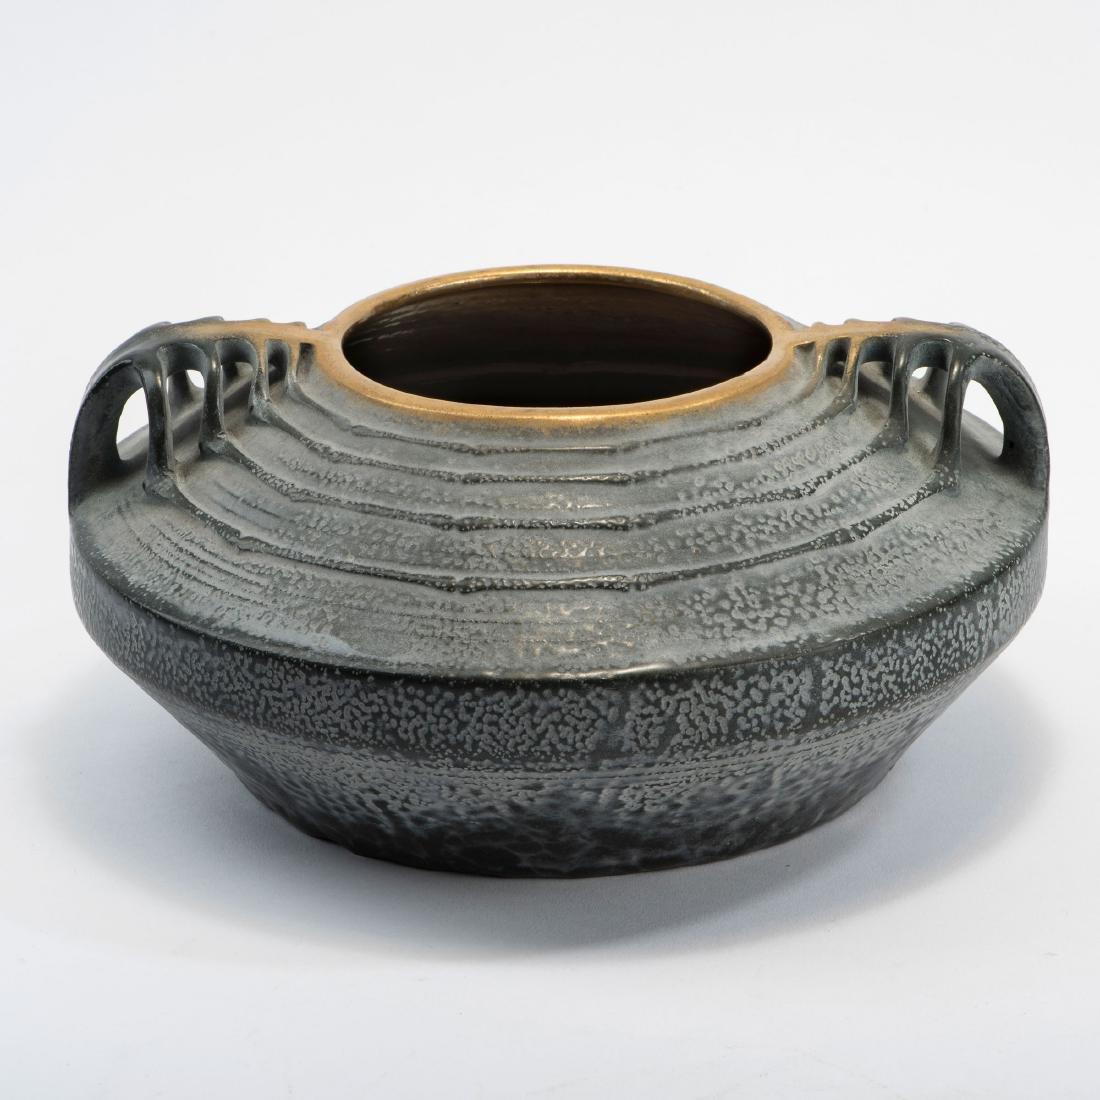 Vase with handles, c1902 - 2